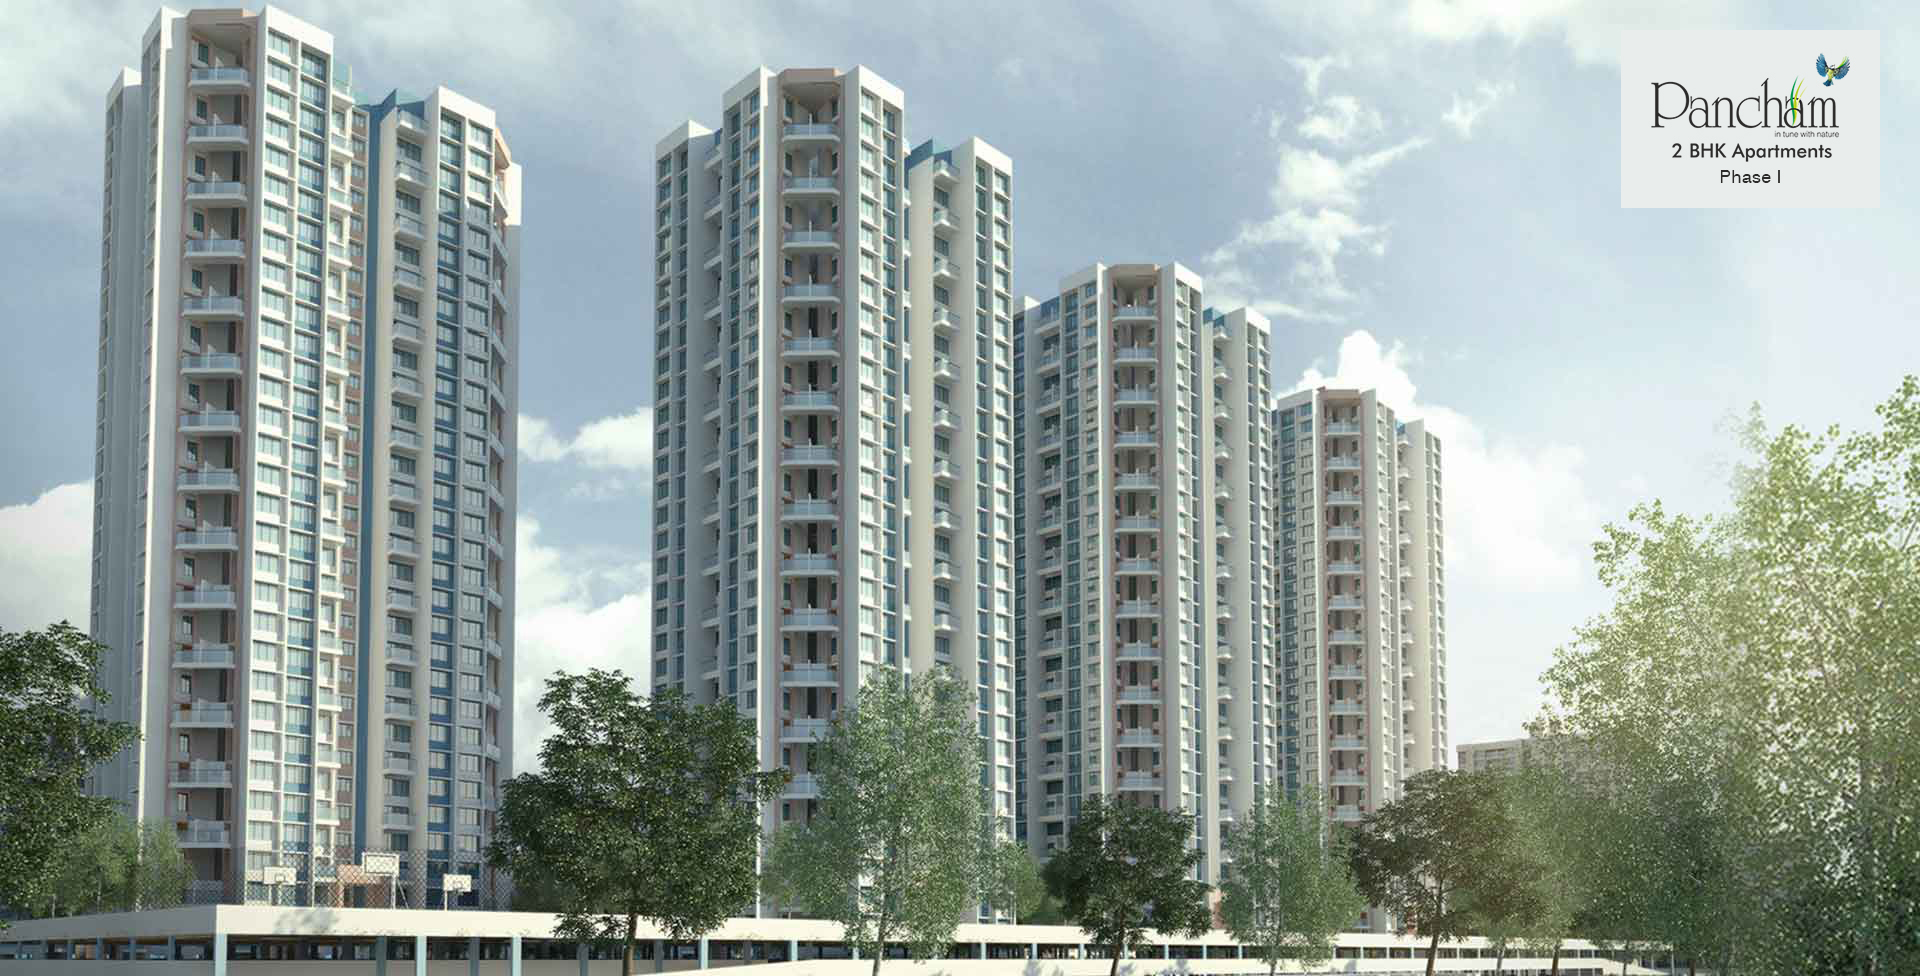 Gated community 2.5 bhk apartments in sinhagad road